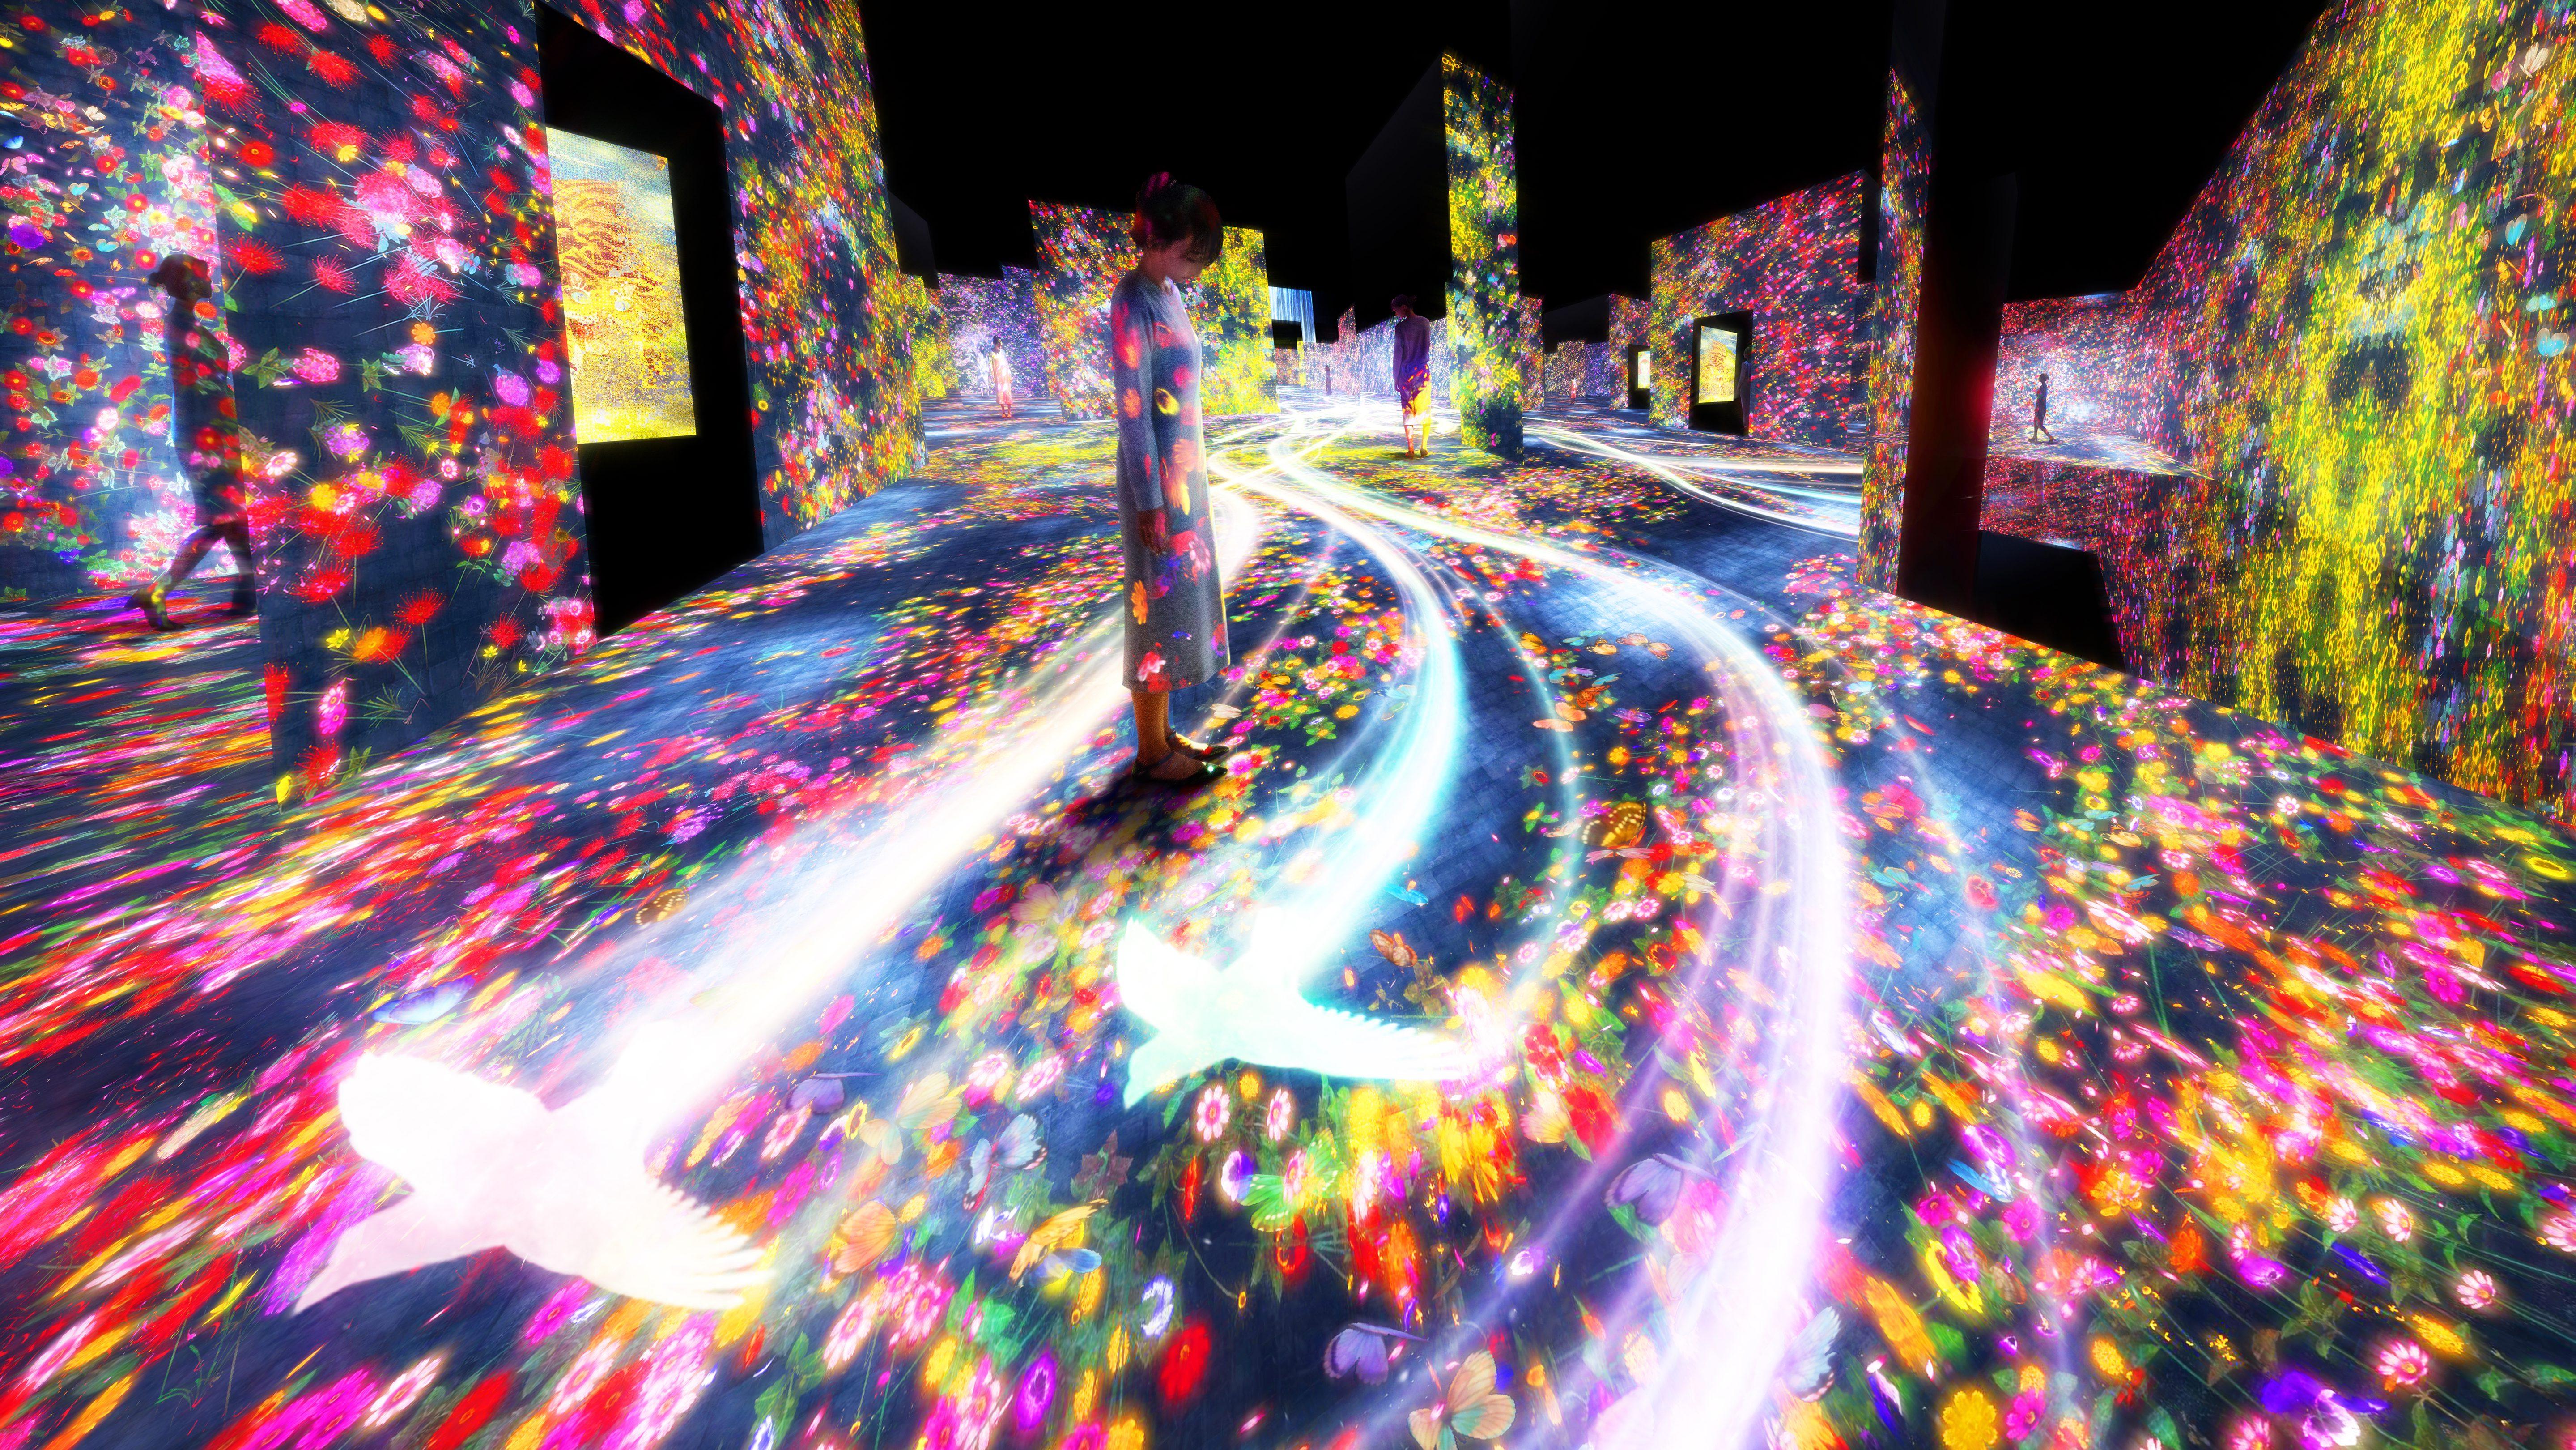 mori building digital art museum teamlab borderless in odaiba